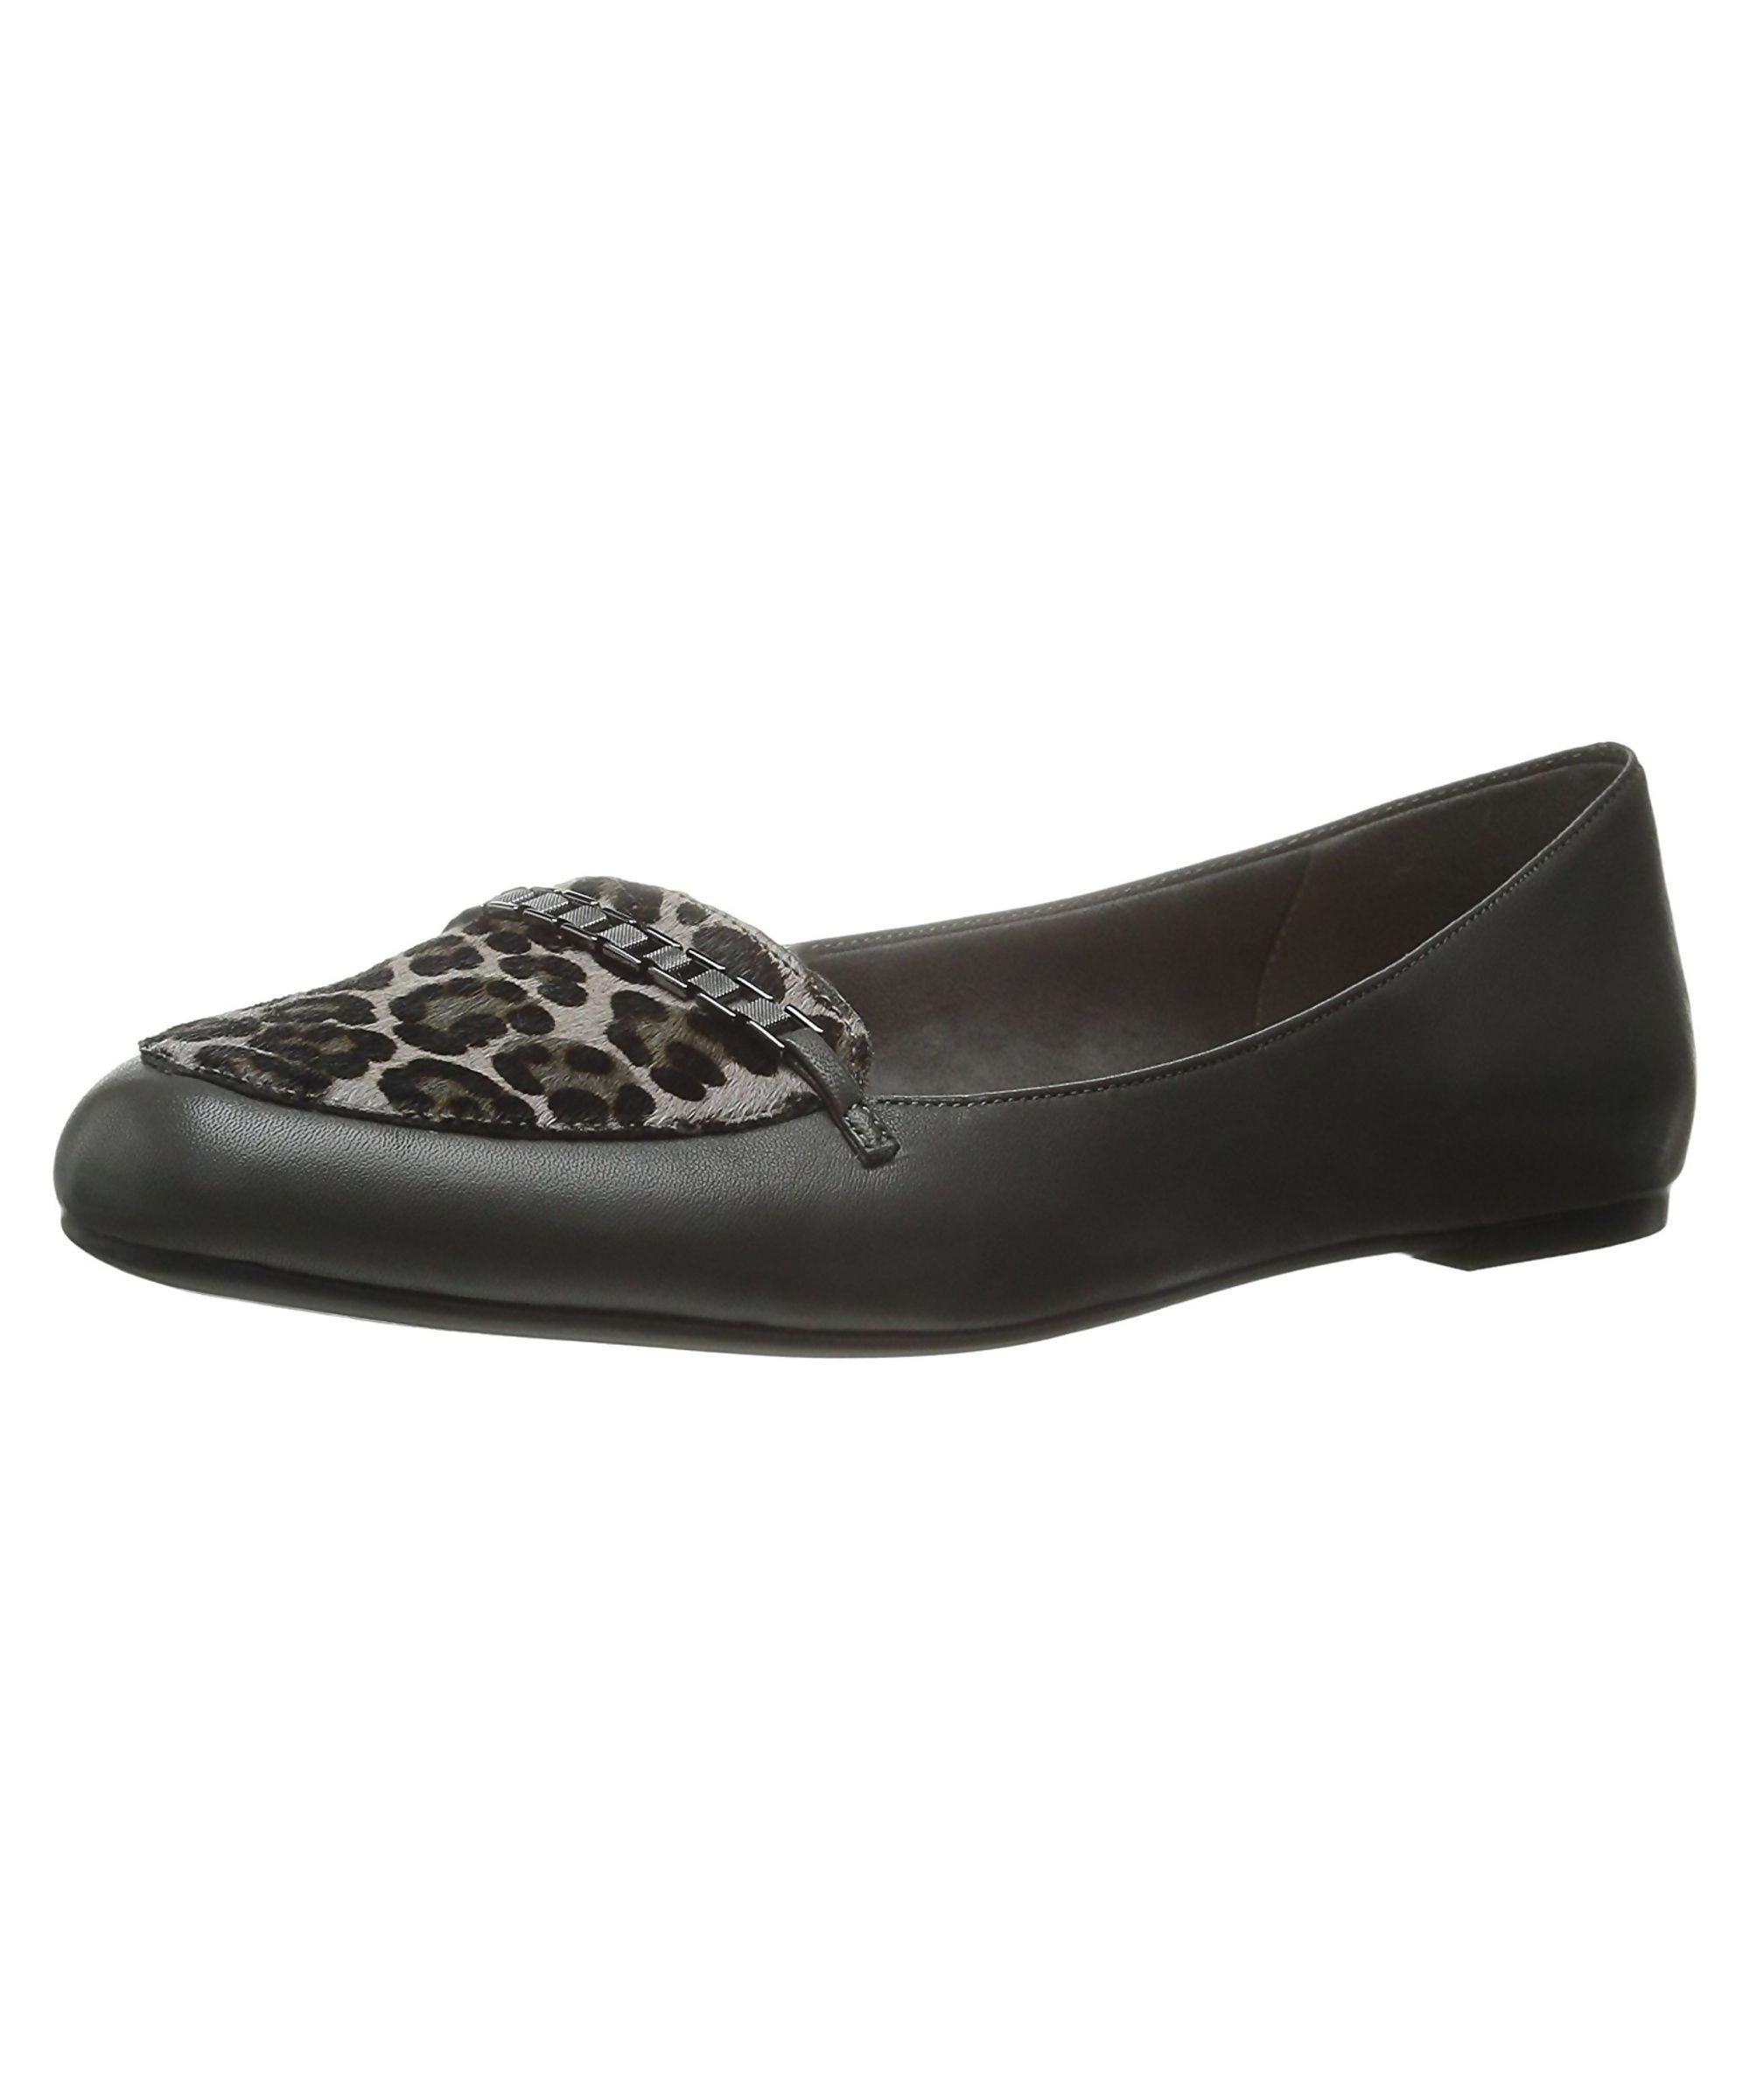 BELLA VITA | Bella Vita Womens Thora Leather Closed Toe Slide Flats #Shoes  #Oxford